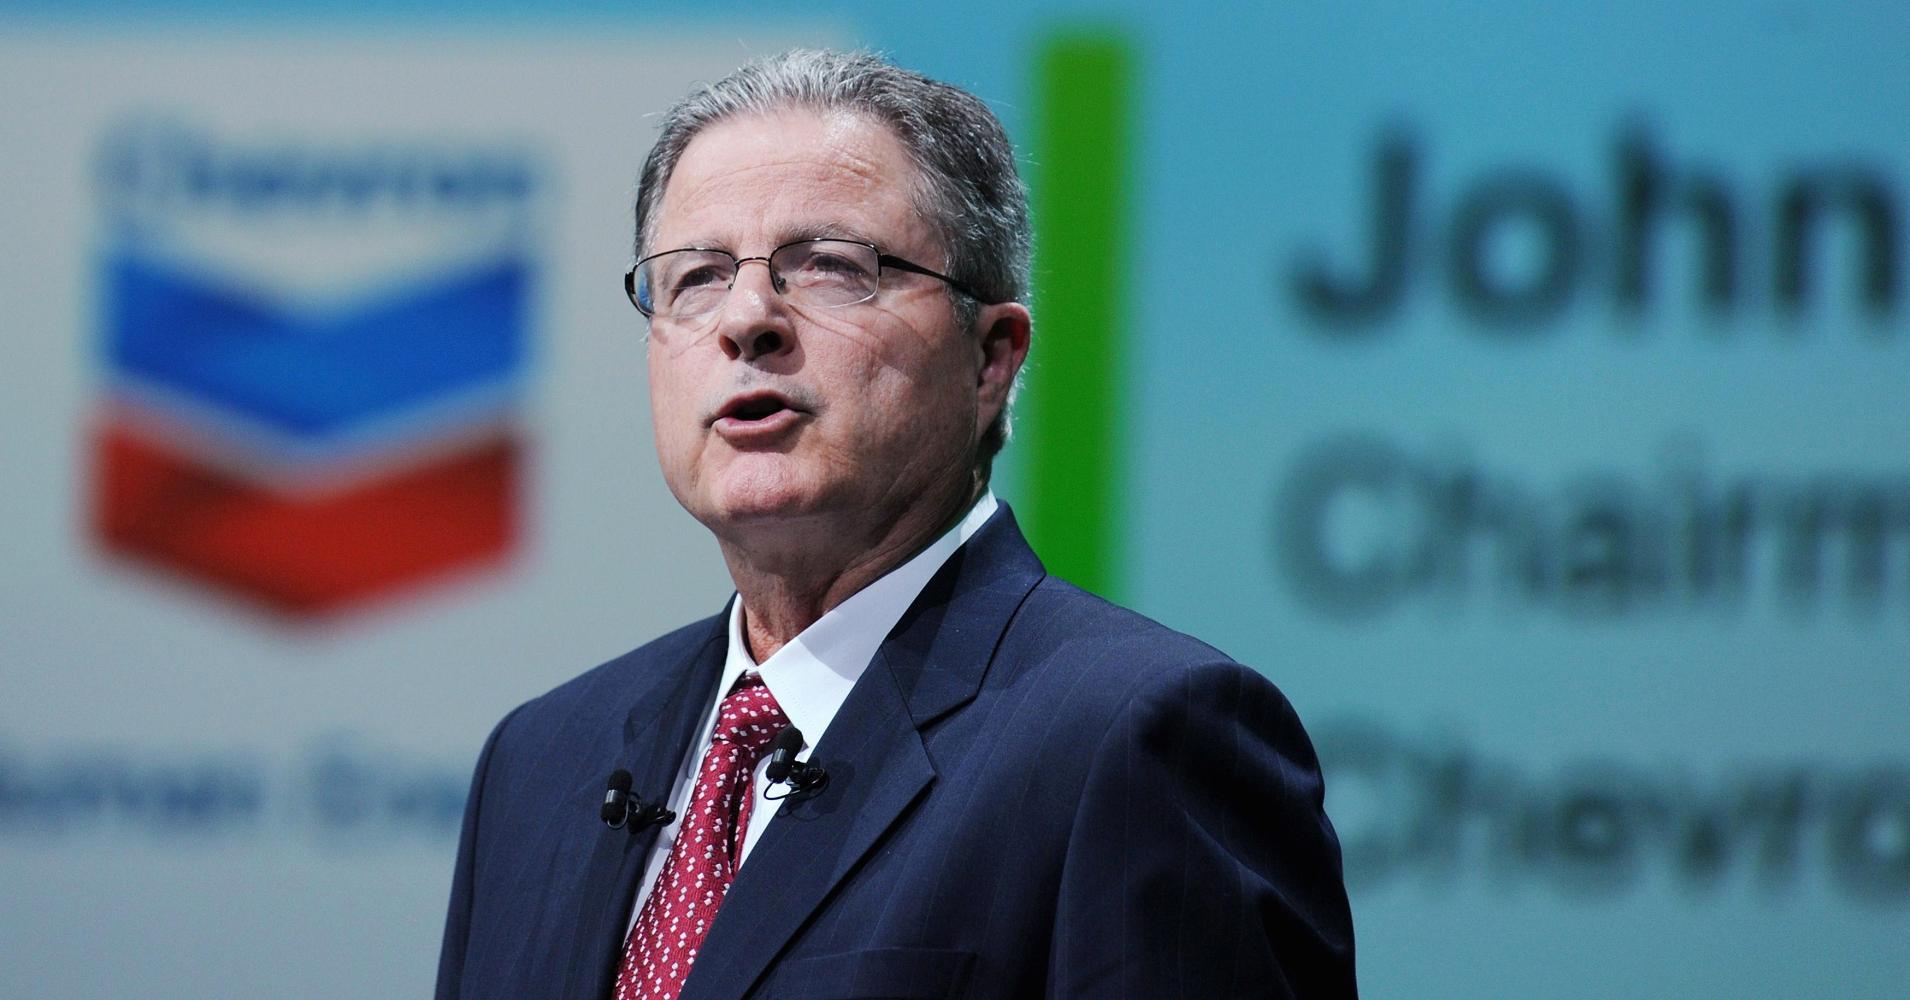 John Watson, Chevron Corp Chief Executive